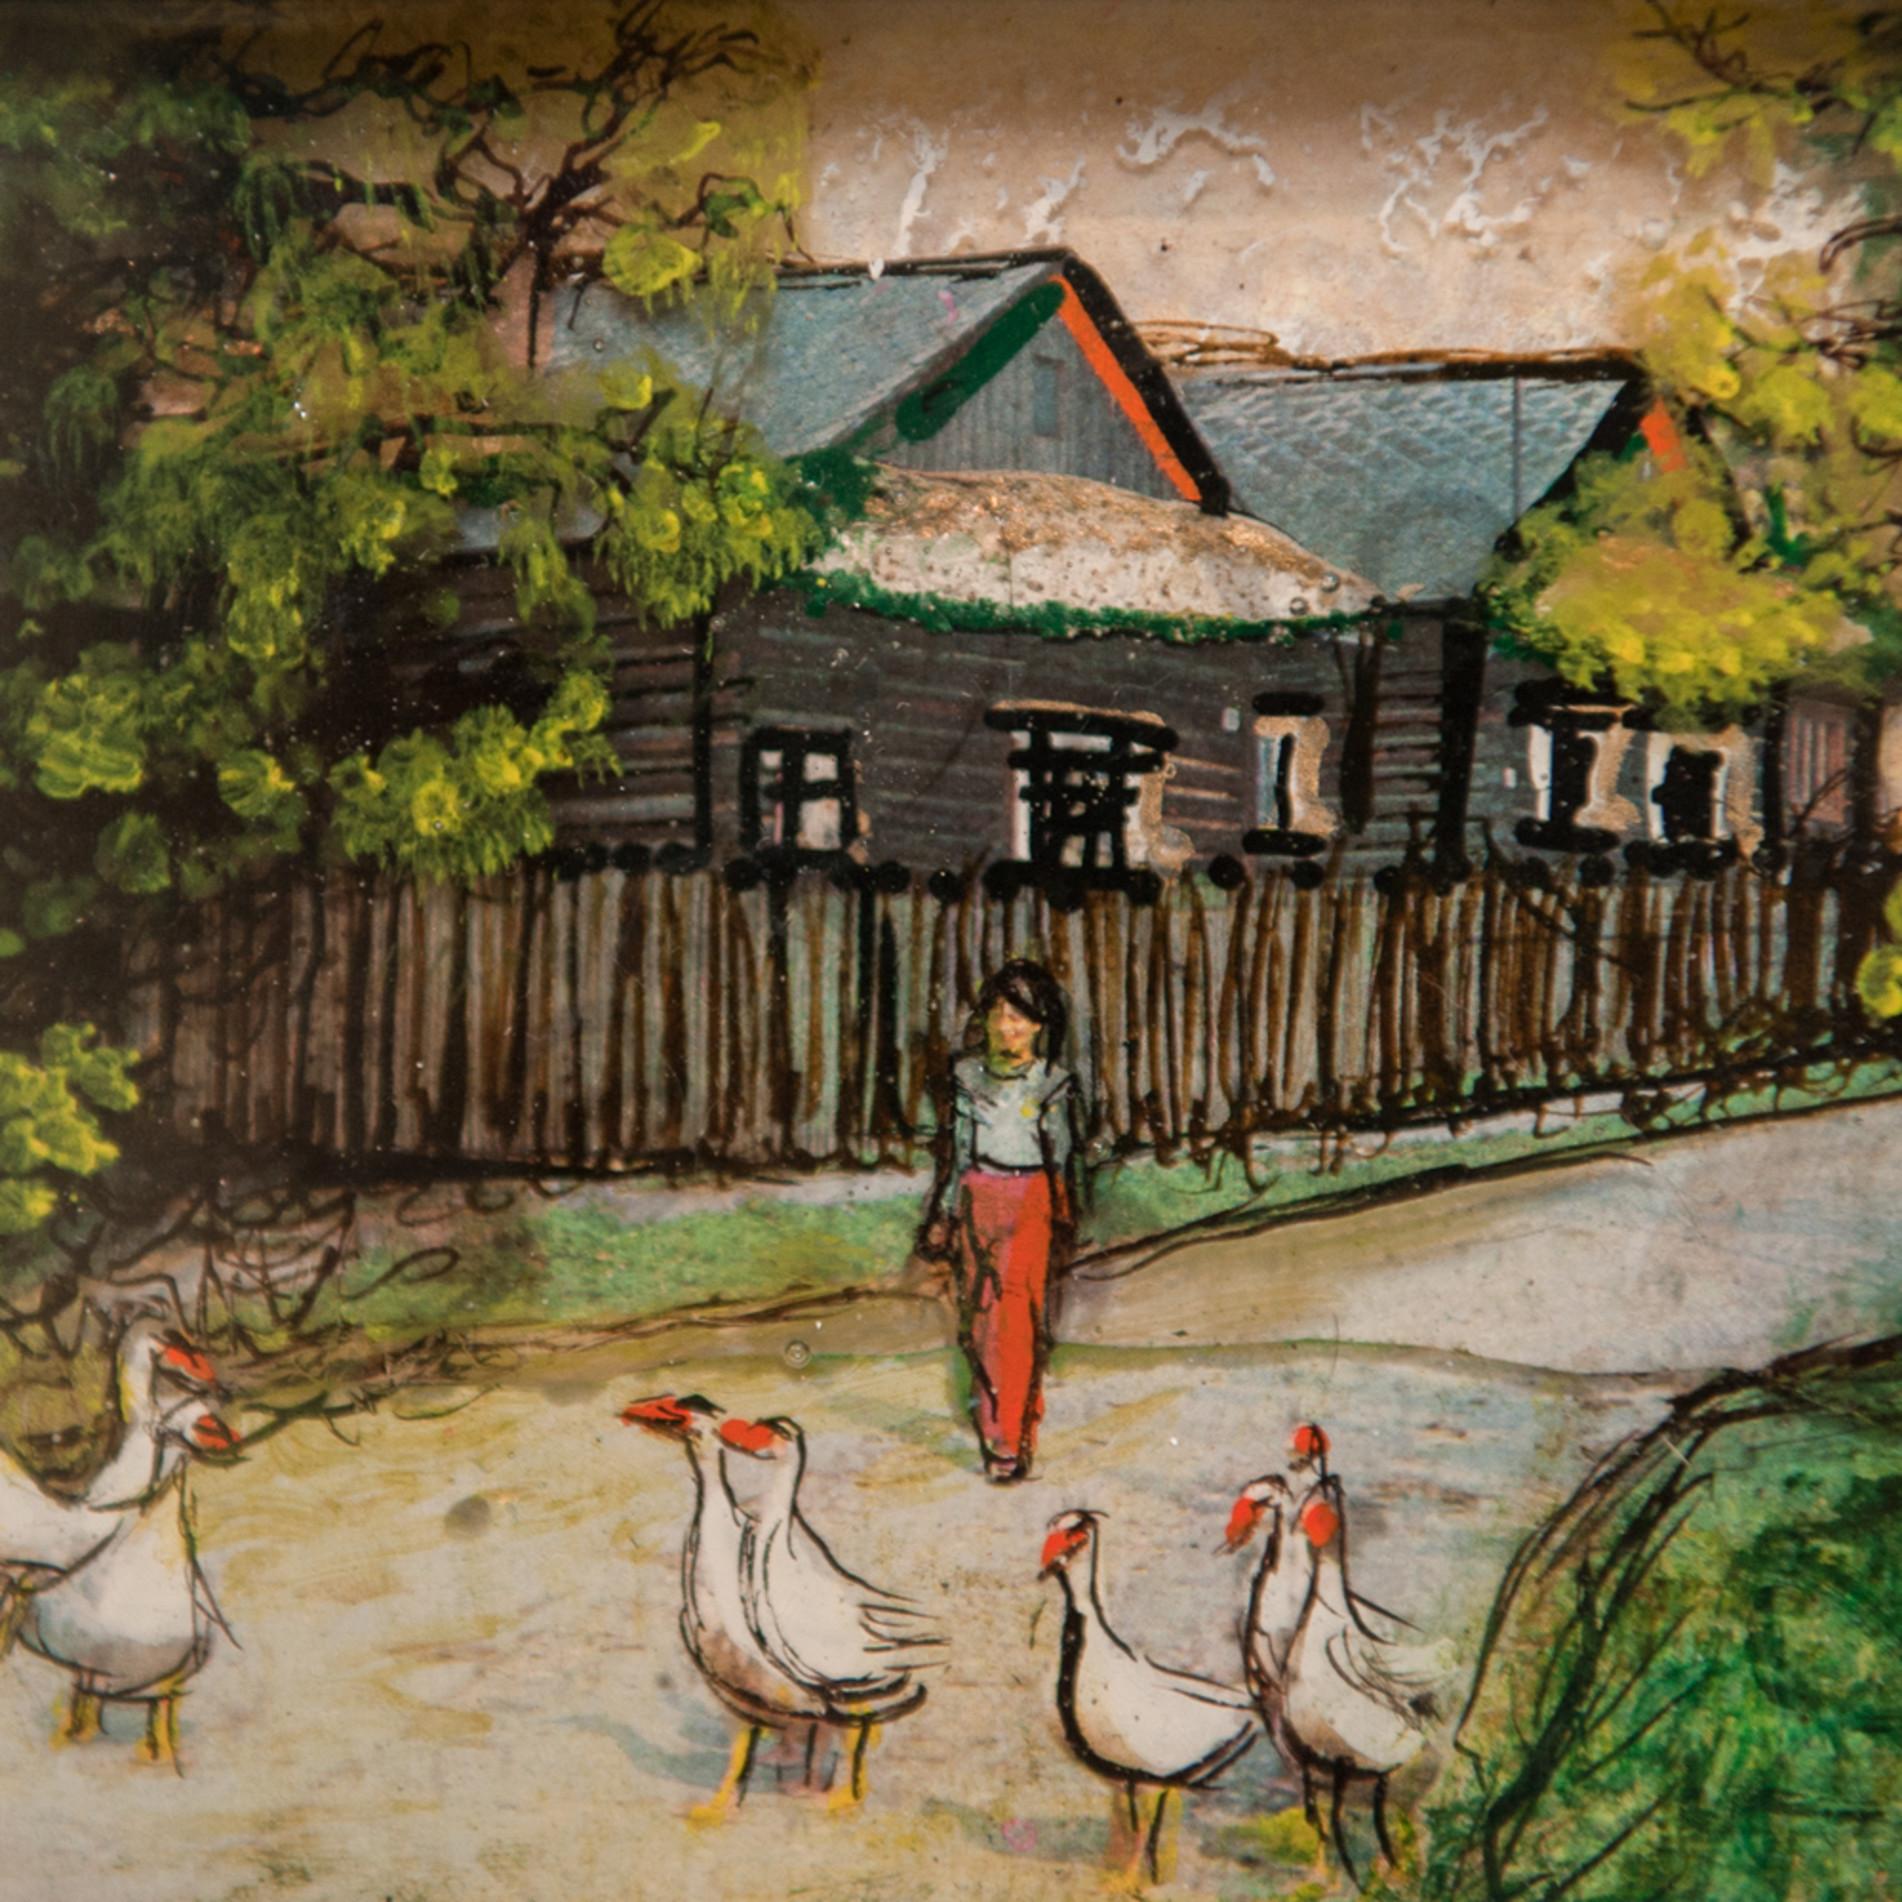 Feed the ducks vlehdw